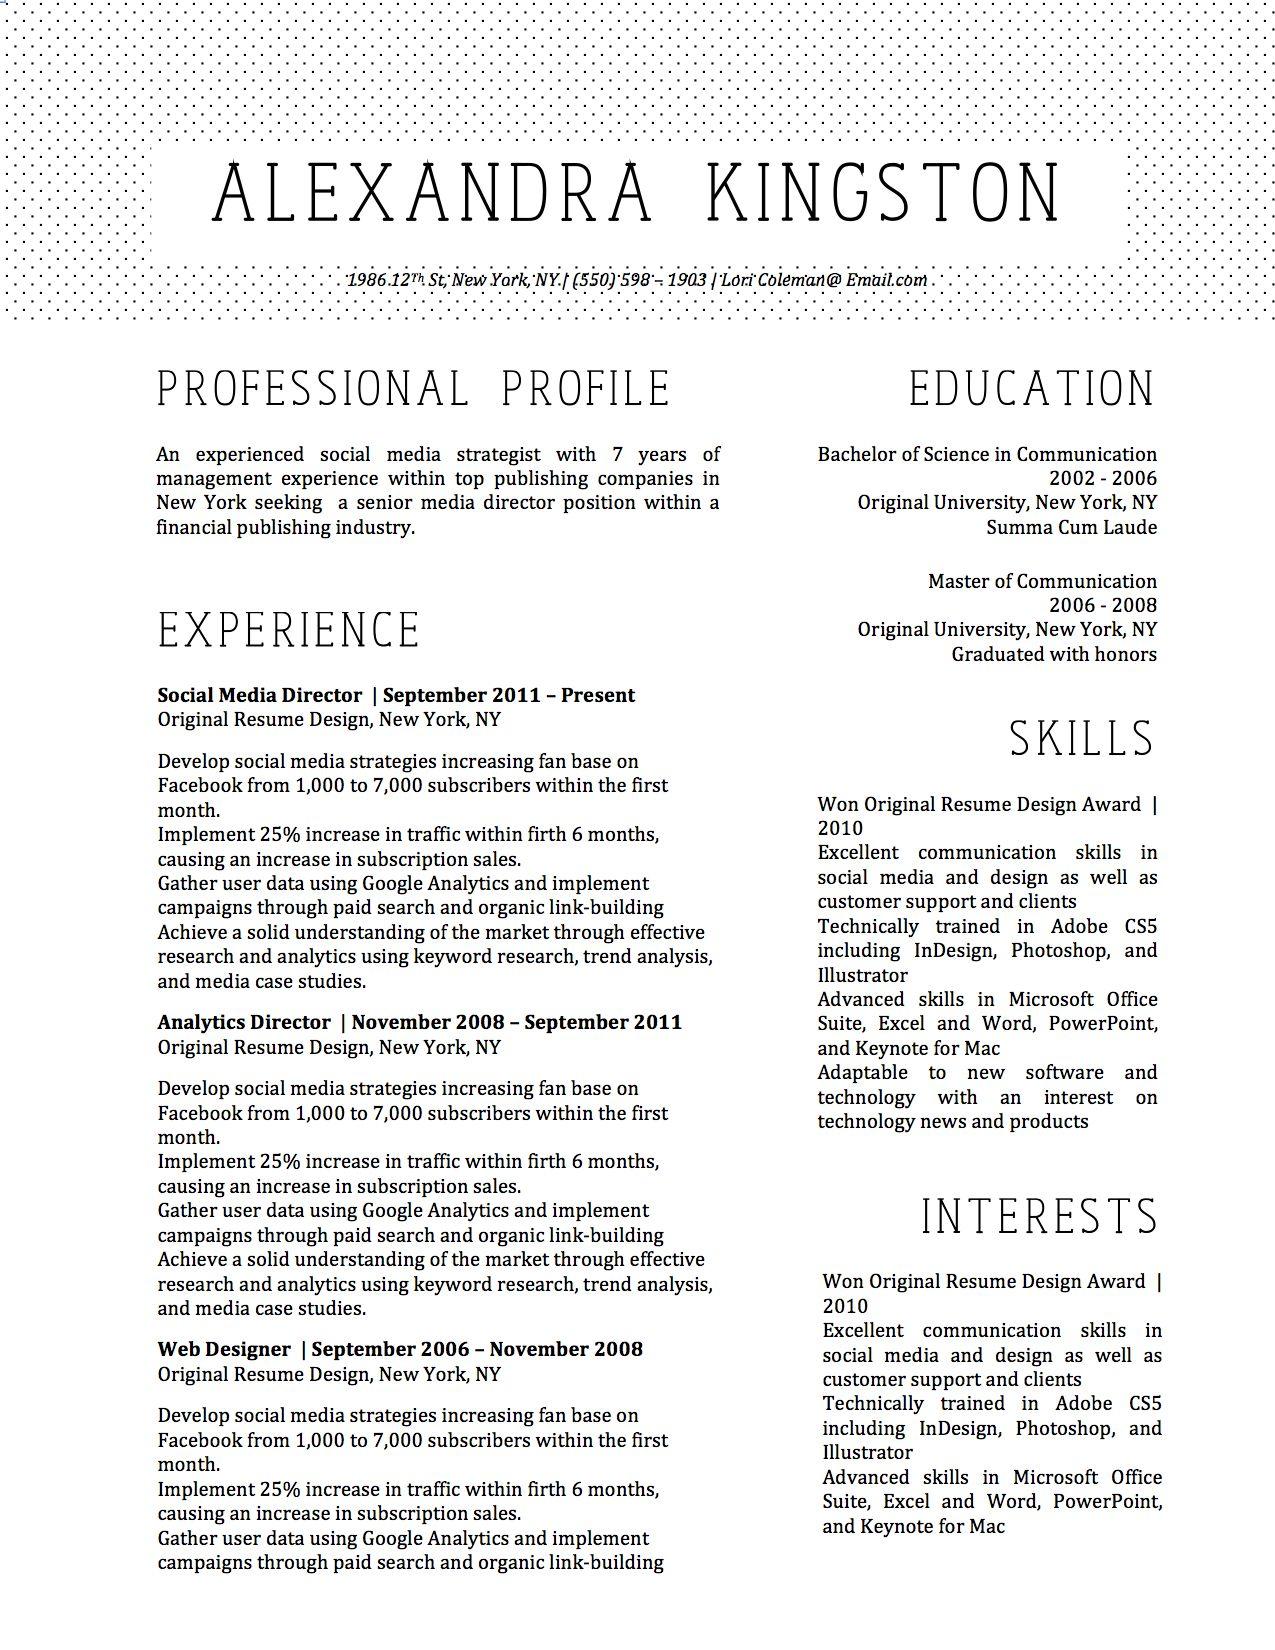 Alexandra Pineapple Resume Template  Alexandra Kingston Resume